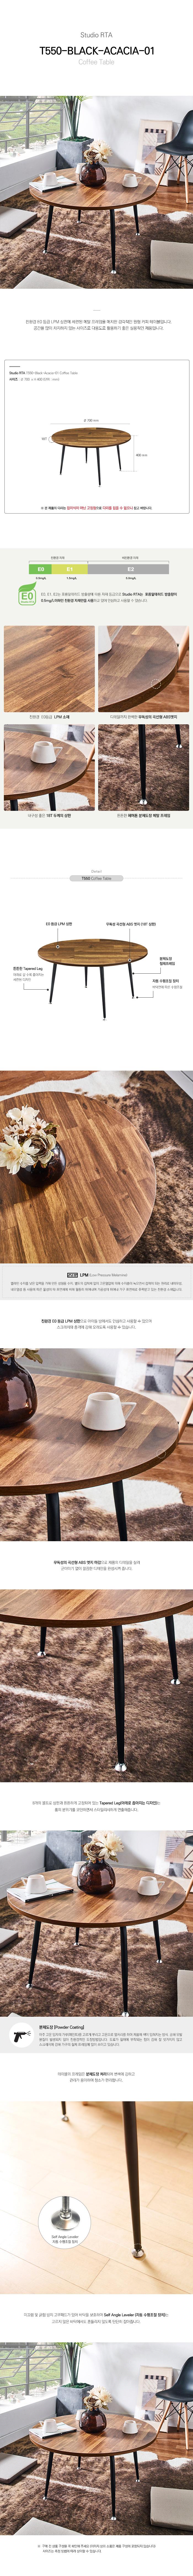 T550-Black-Acacia-01_Coffee-Table_190920